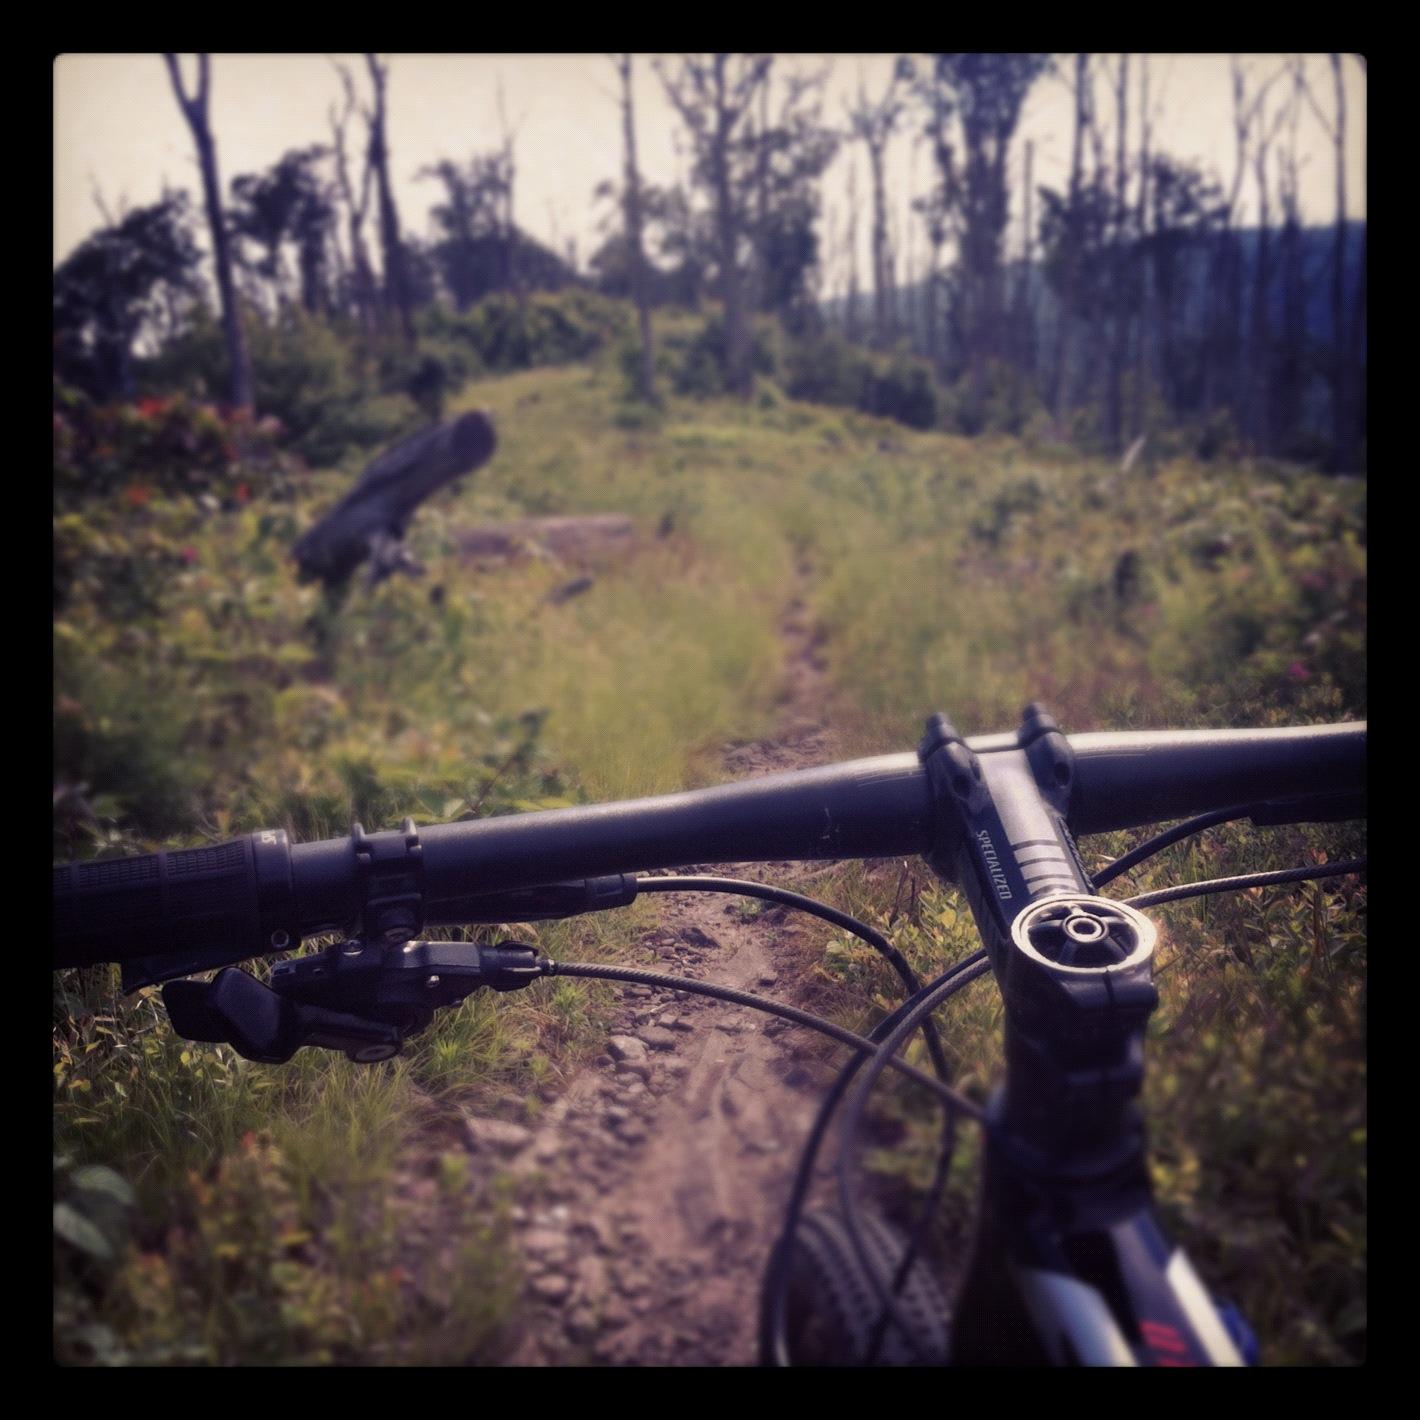 A mountain bike ride